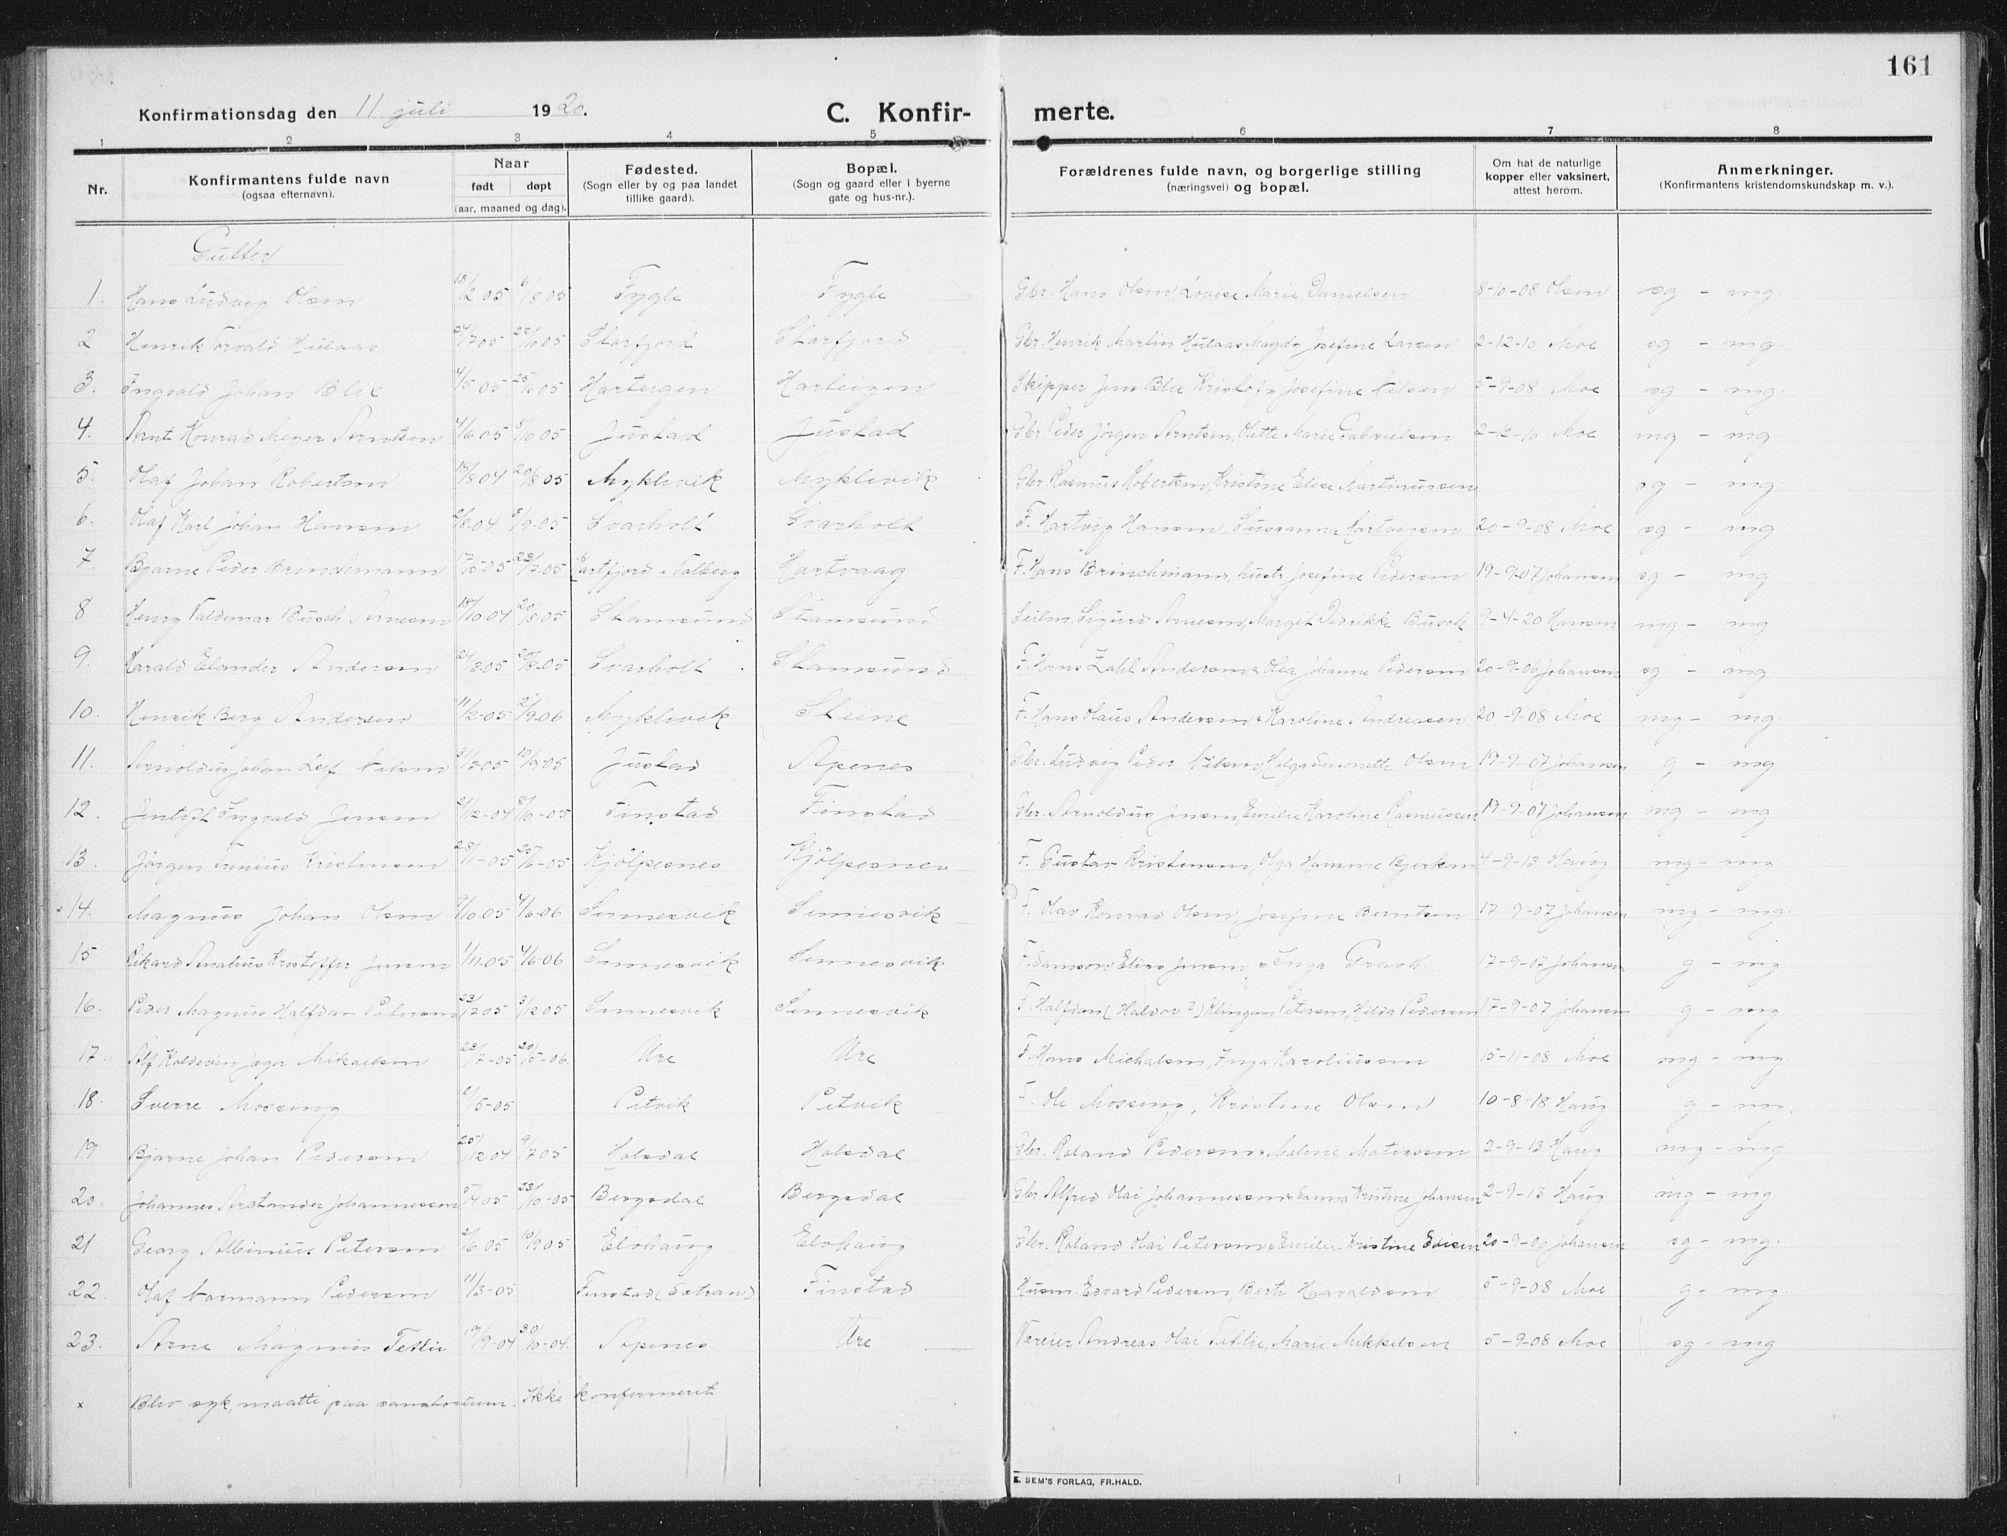 SAT, Ministerialprotokoller, klokkerbøker og fødselsregistre - Nordland, 882/L1183: Klokkerbok nr. 882C01, 1911-1938, s. 161